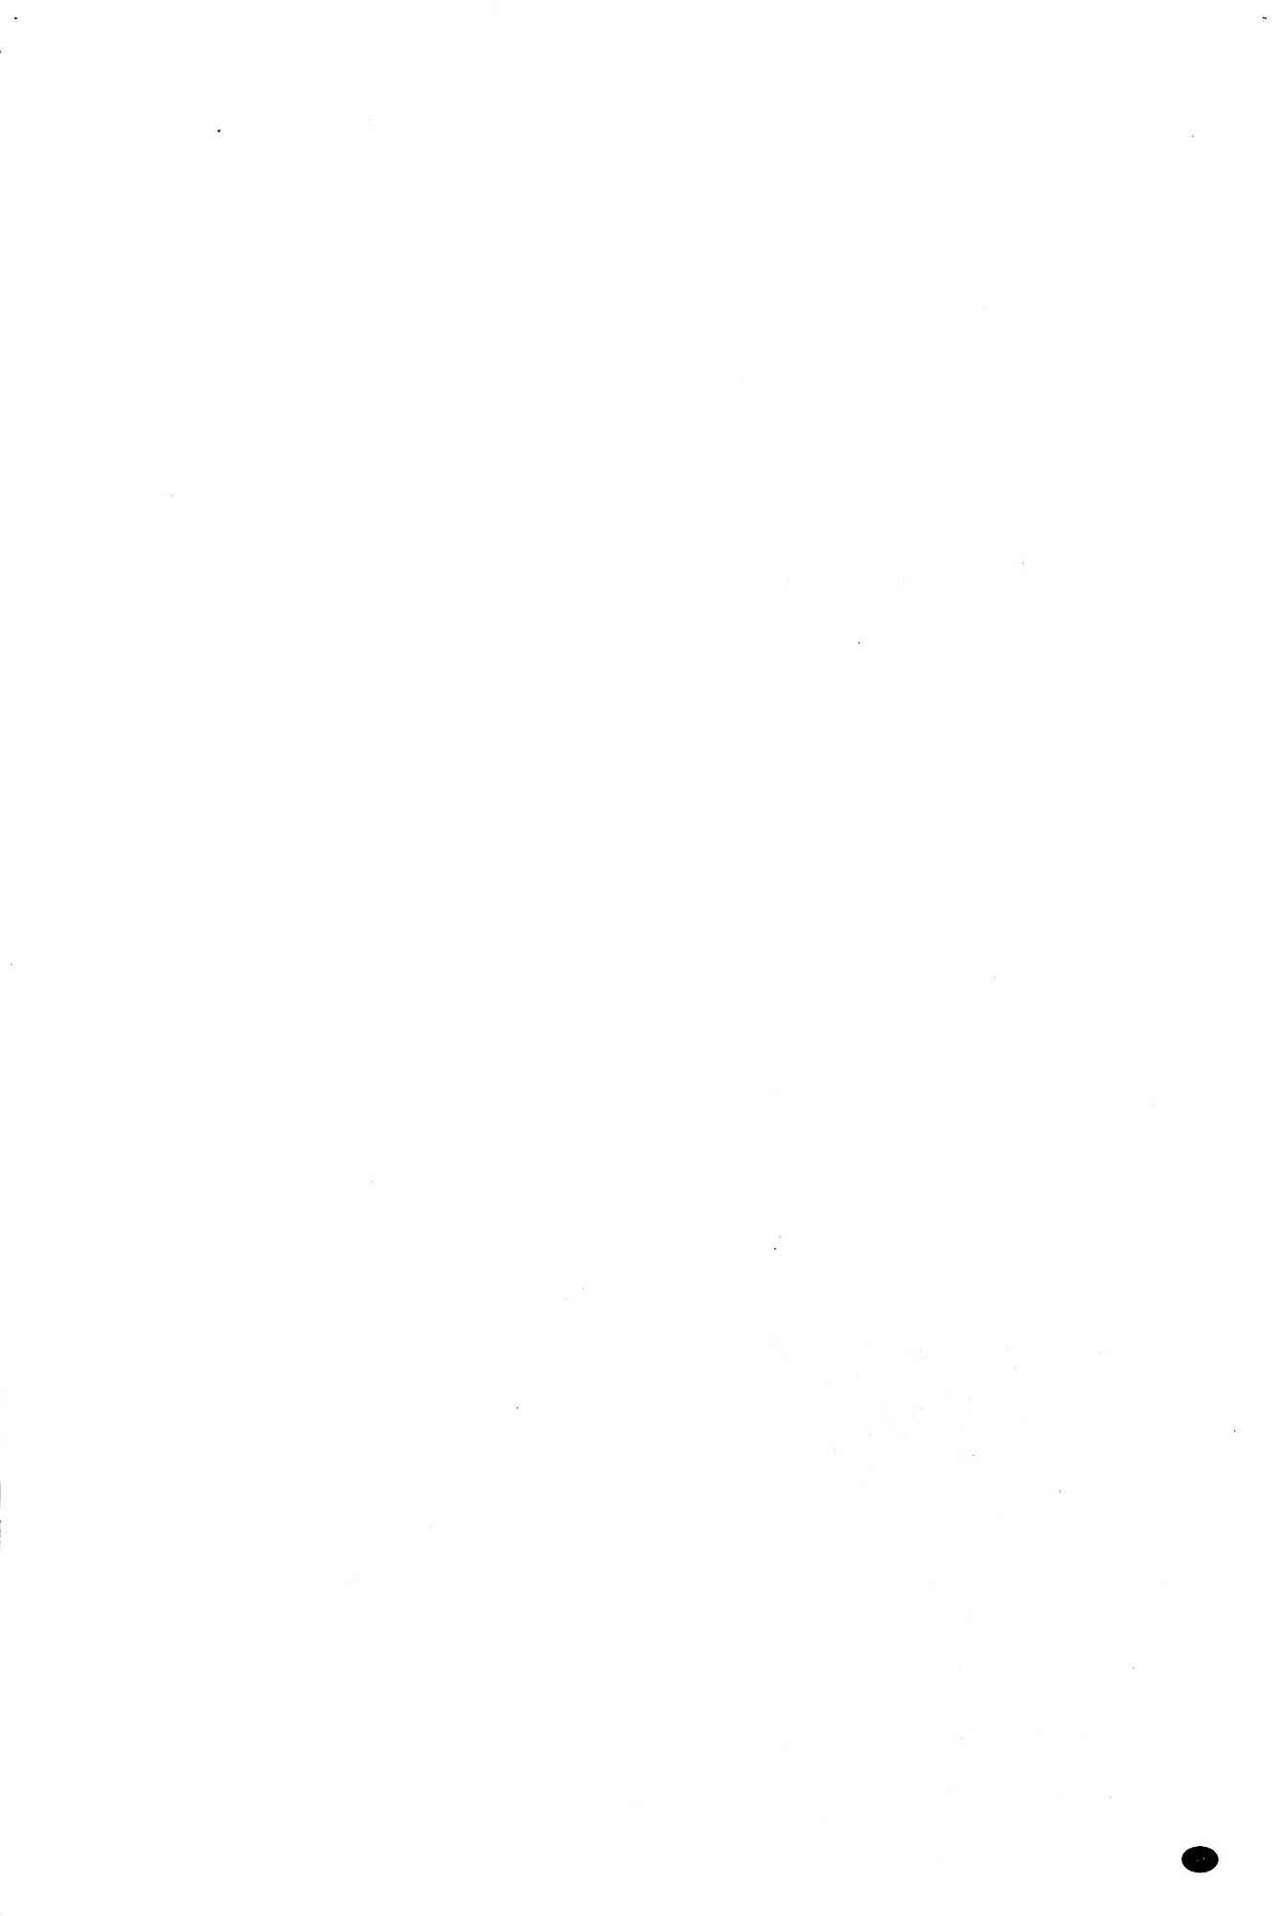 [Gotoh Akira]  21-ji no Onna ~Camera no Mae no Mesuinu~ 2 | 21時之女 ~鏡頭前的牝犬~ 2 [Chinese] 97